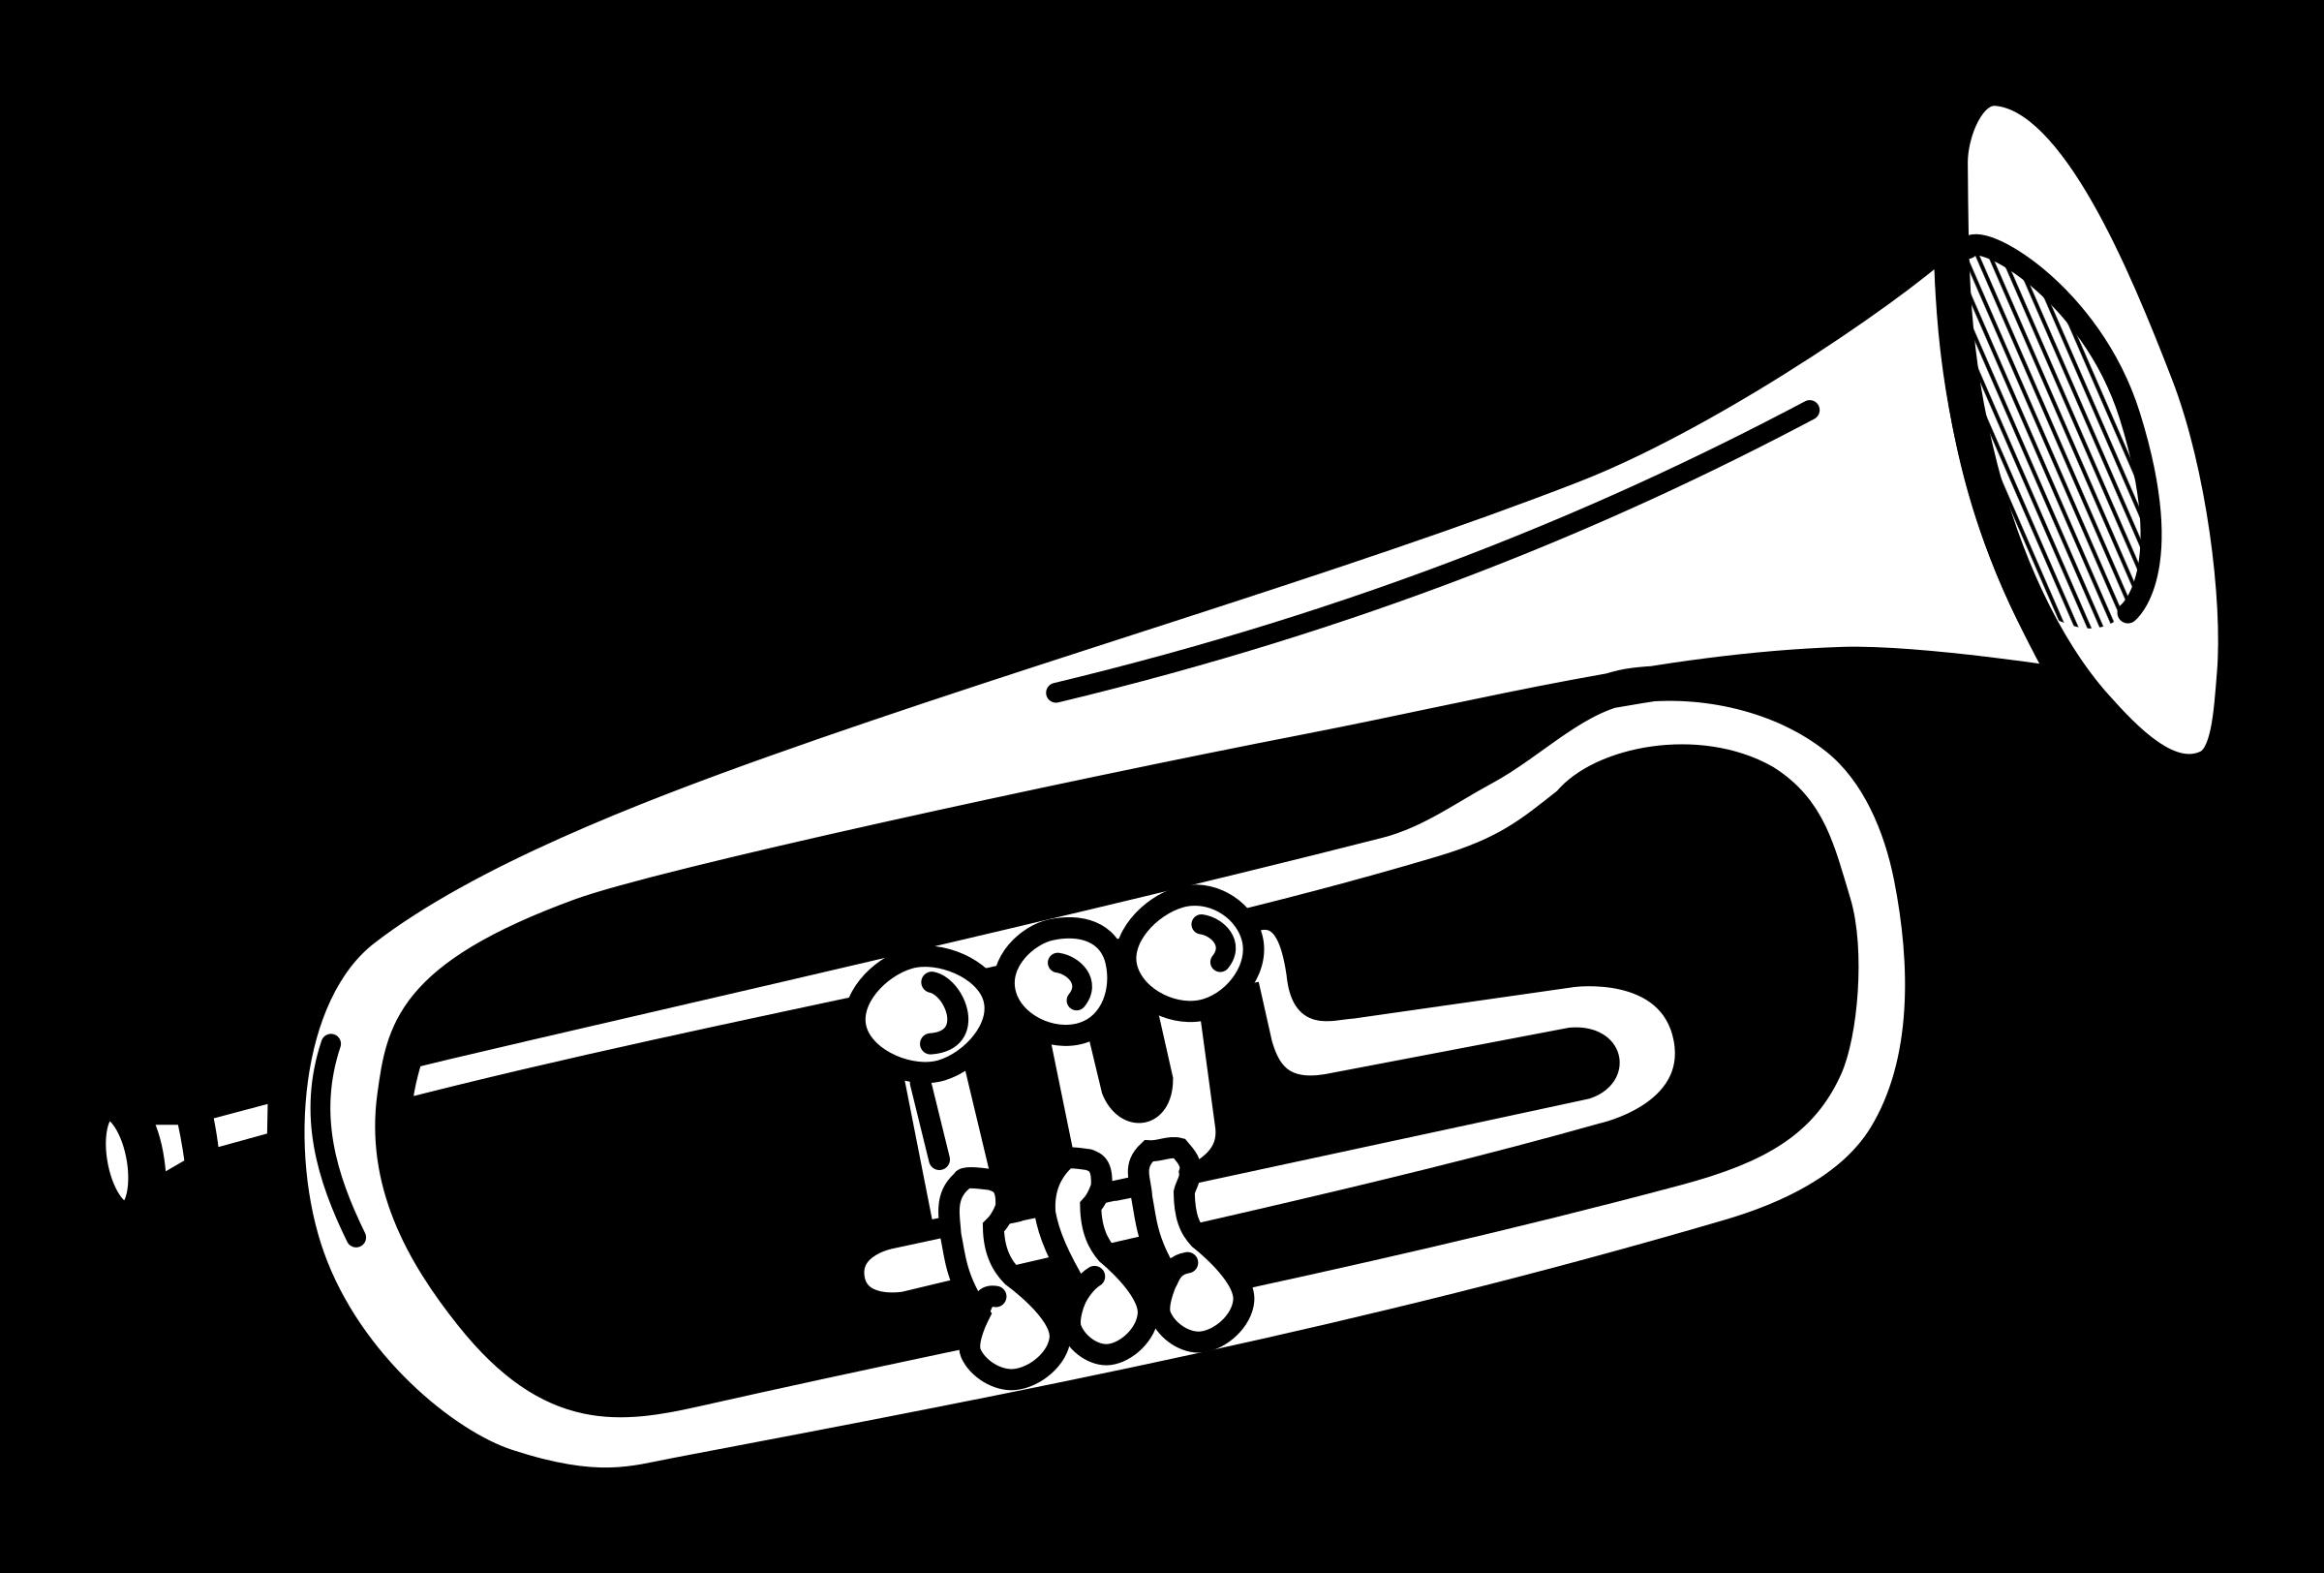 Trumpet clipart images svg freeuse download Trumpet clip art free clipart images 3 wikiclipart ... svg freeuse download